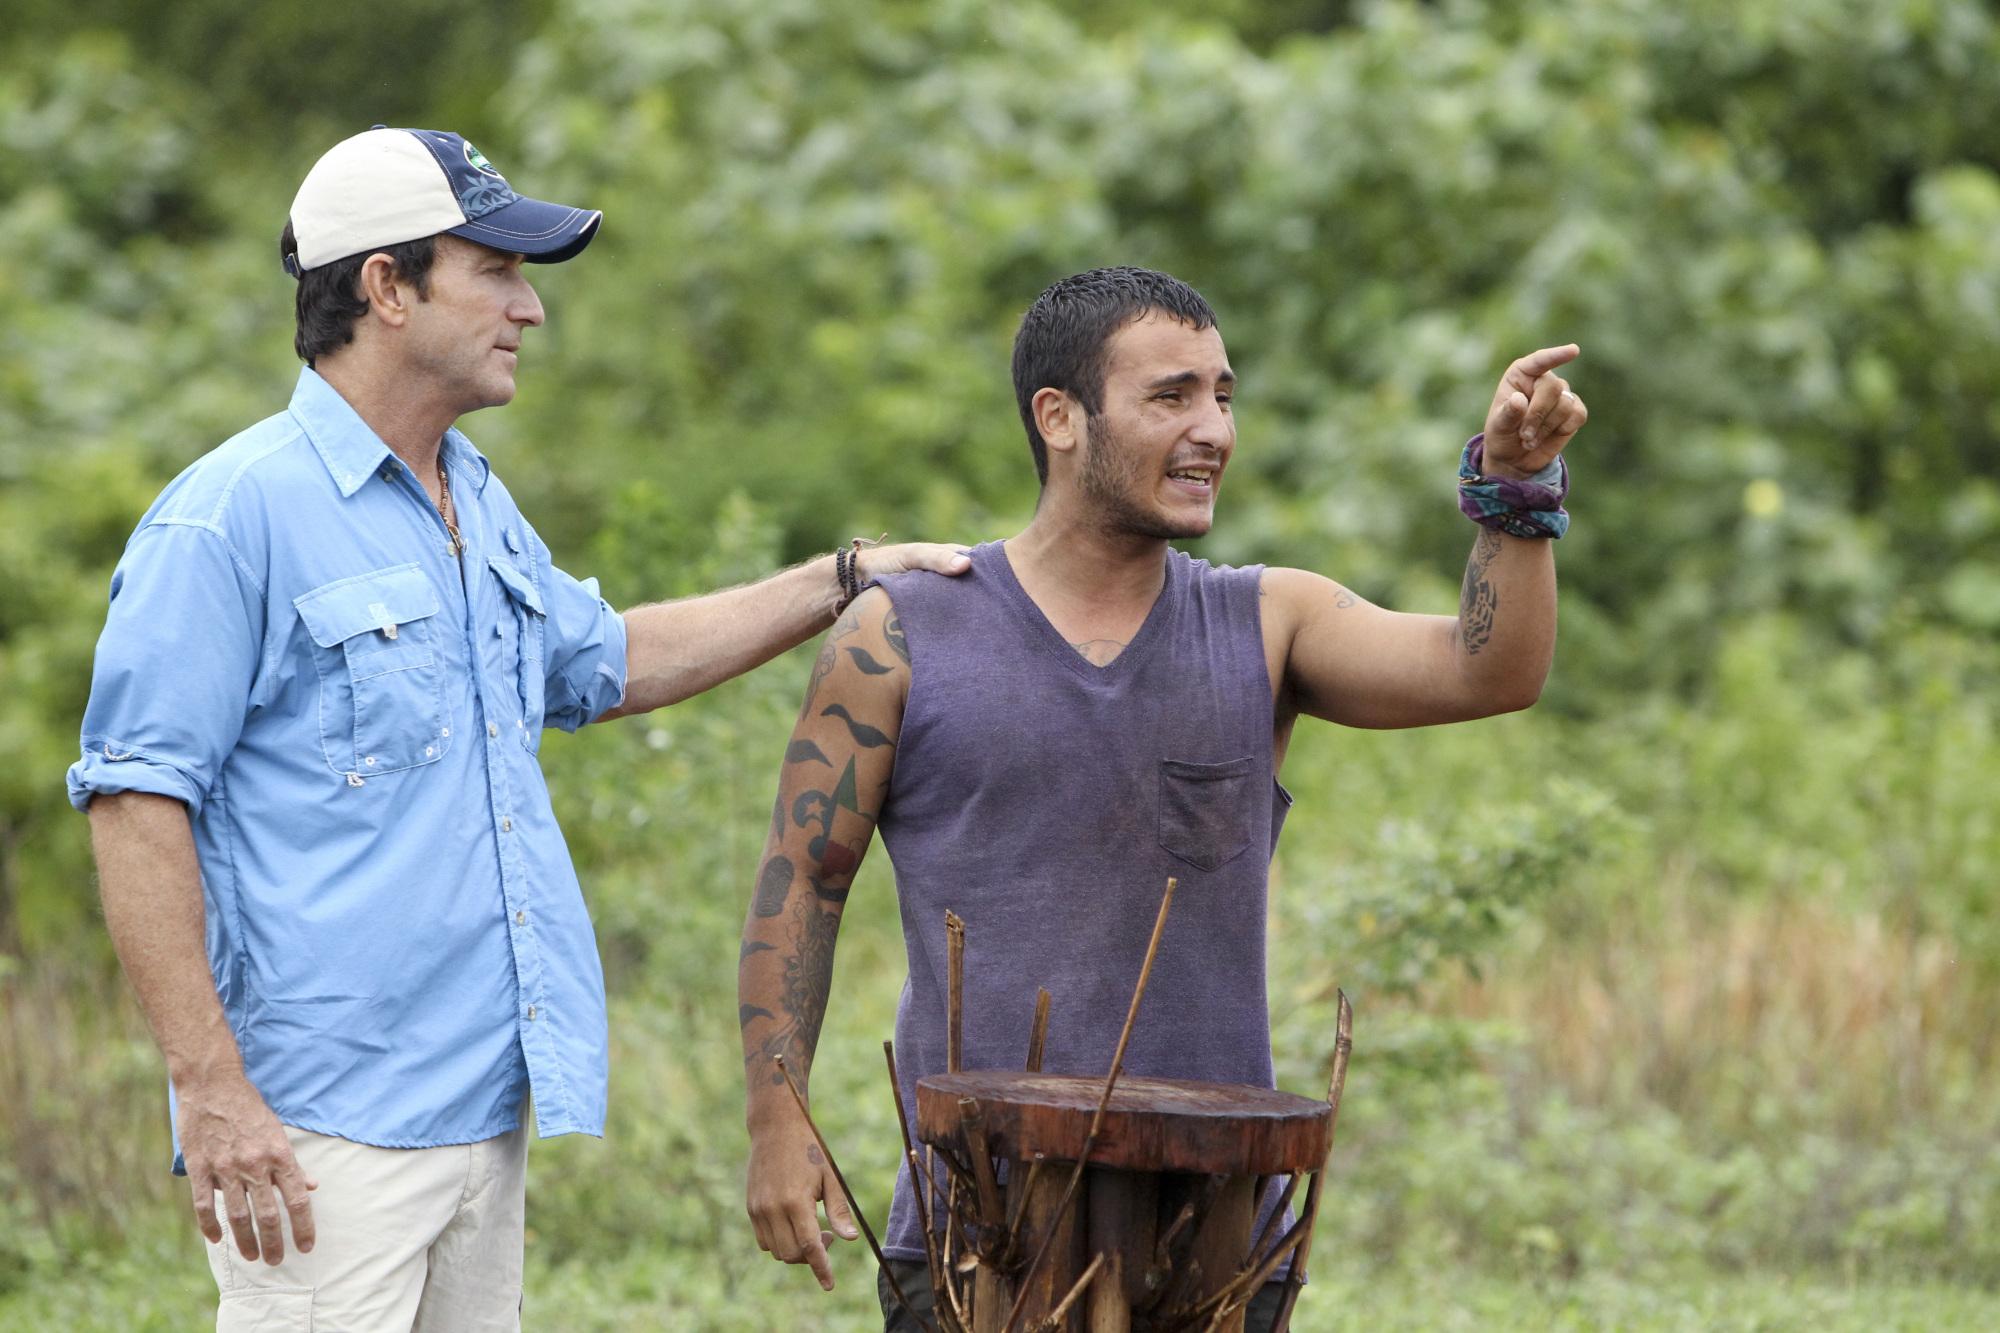 Jeff holds back Brandon in